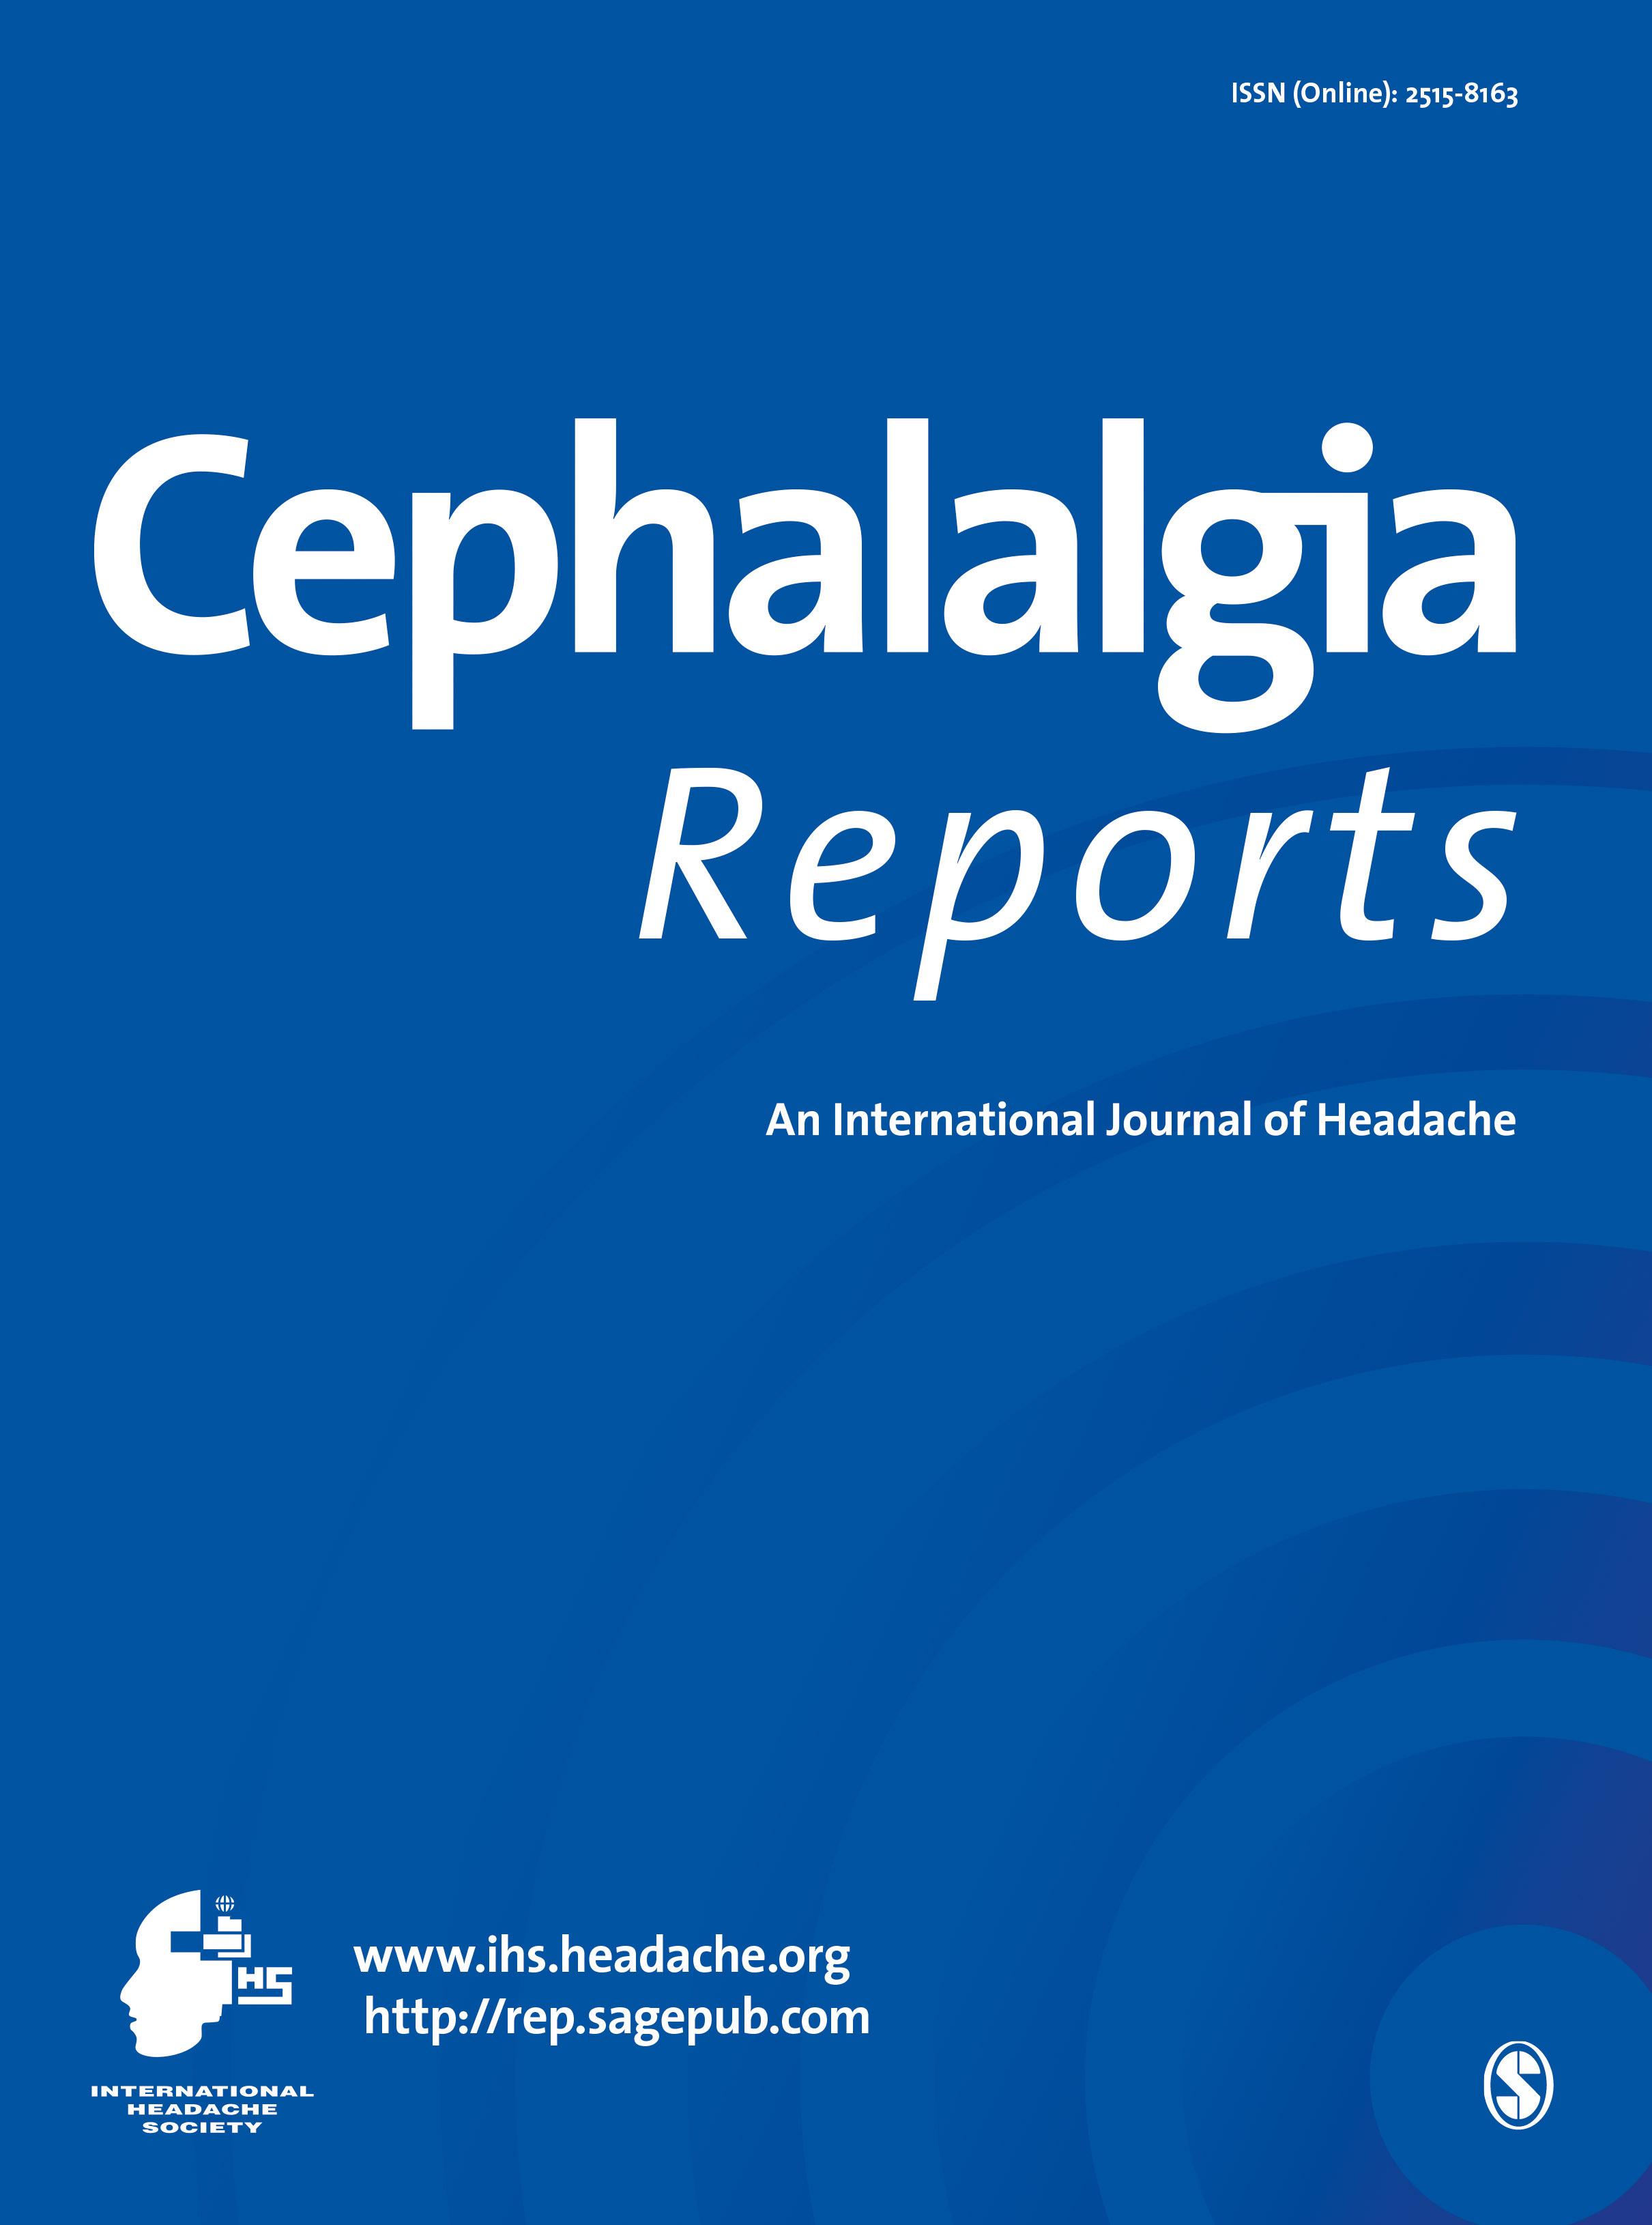 Cephalalgia Reports